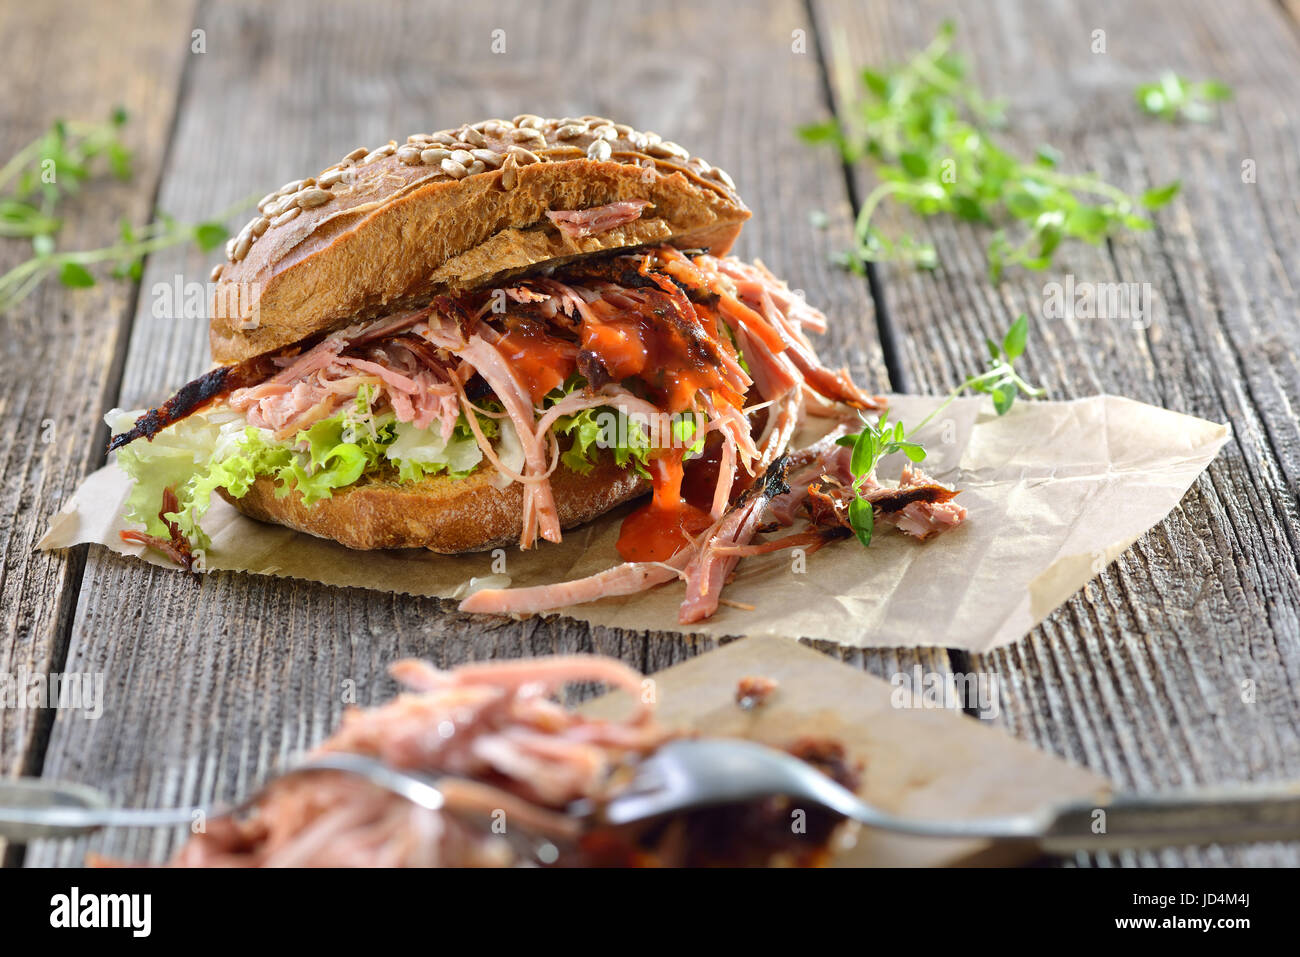 Comida en la calle: carne de cerdo barbacoa sandwich integrales con coleslaw, salsa barbacoa caliente servido en Imagen De Stock